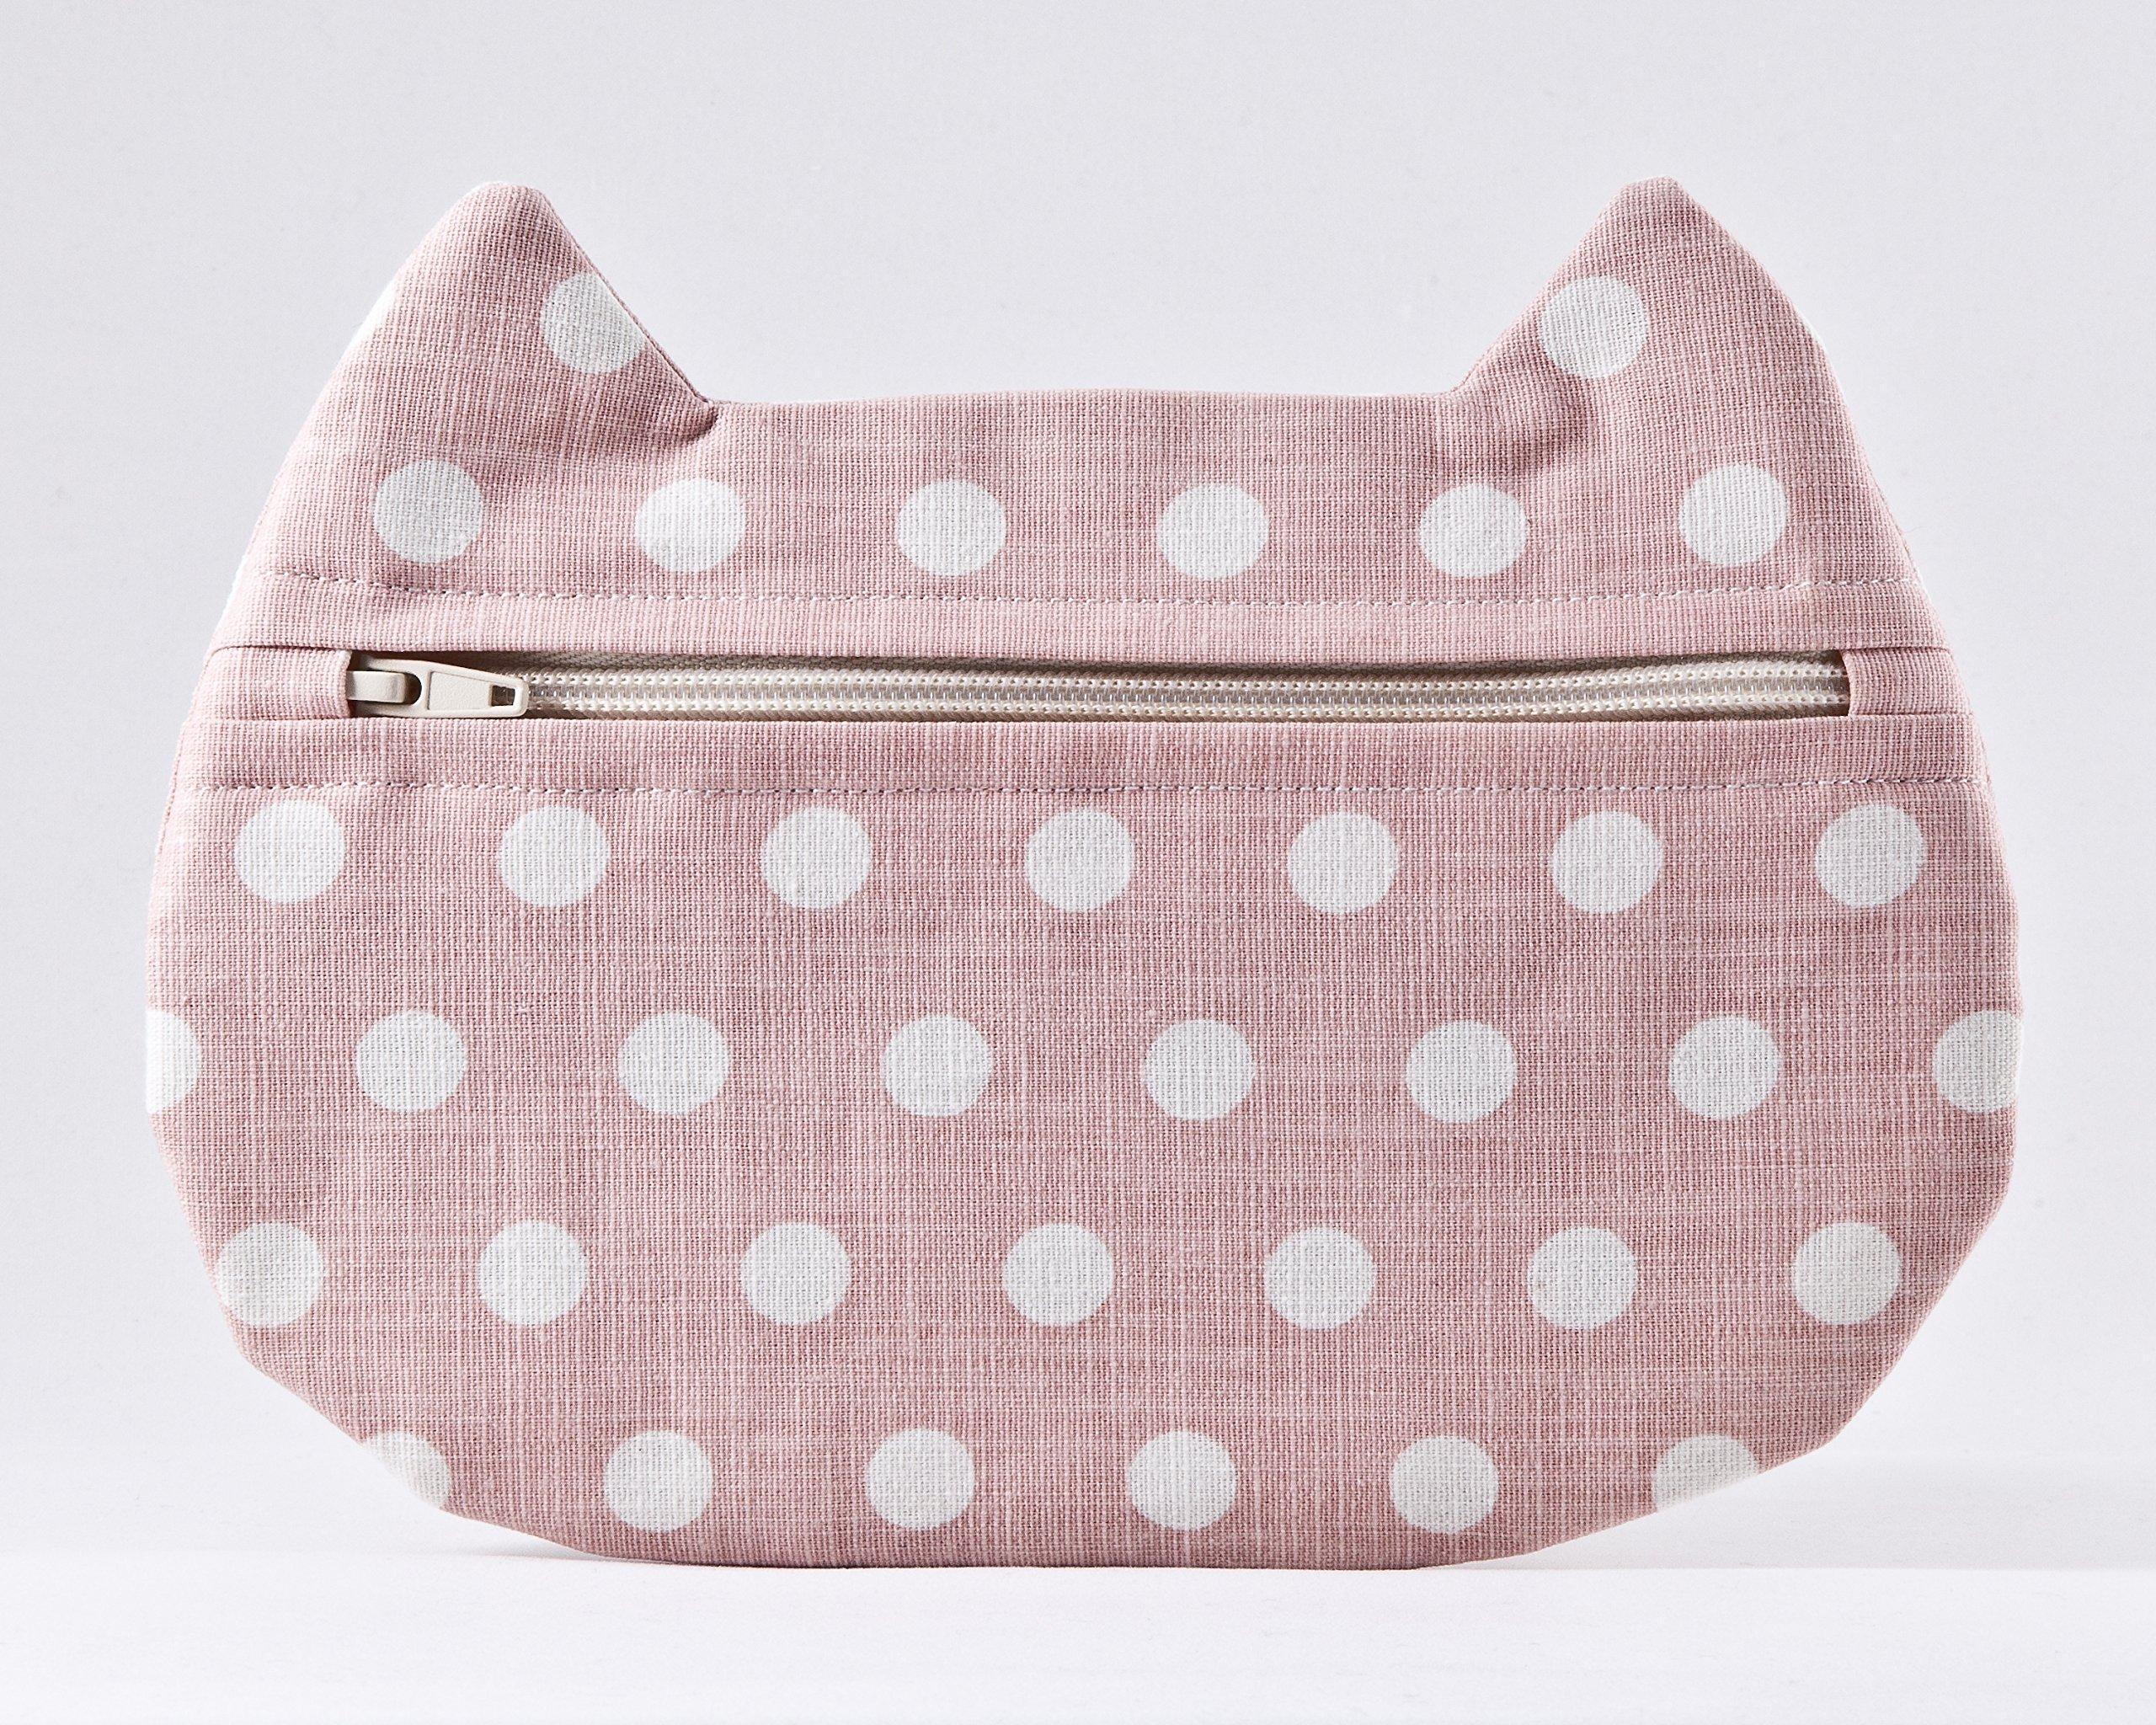 Pink Cosmetic Bag, Cat Makeup Bag, Polka Dot Pencil Case, Toiletries Bag, Beauty Bag